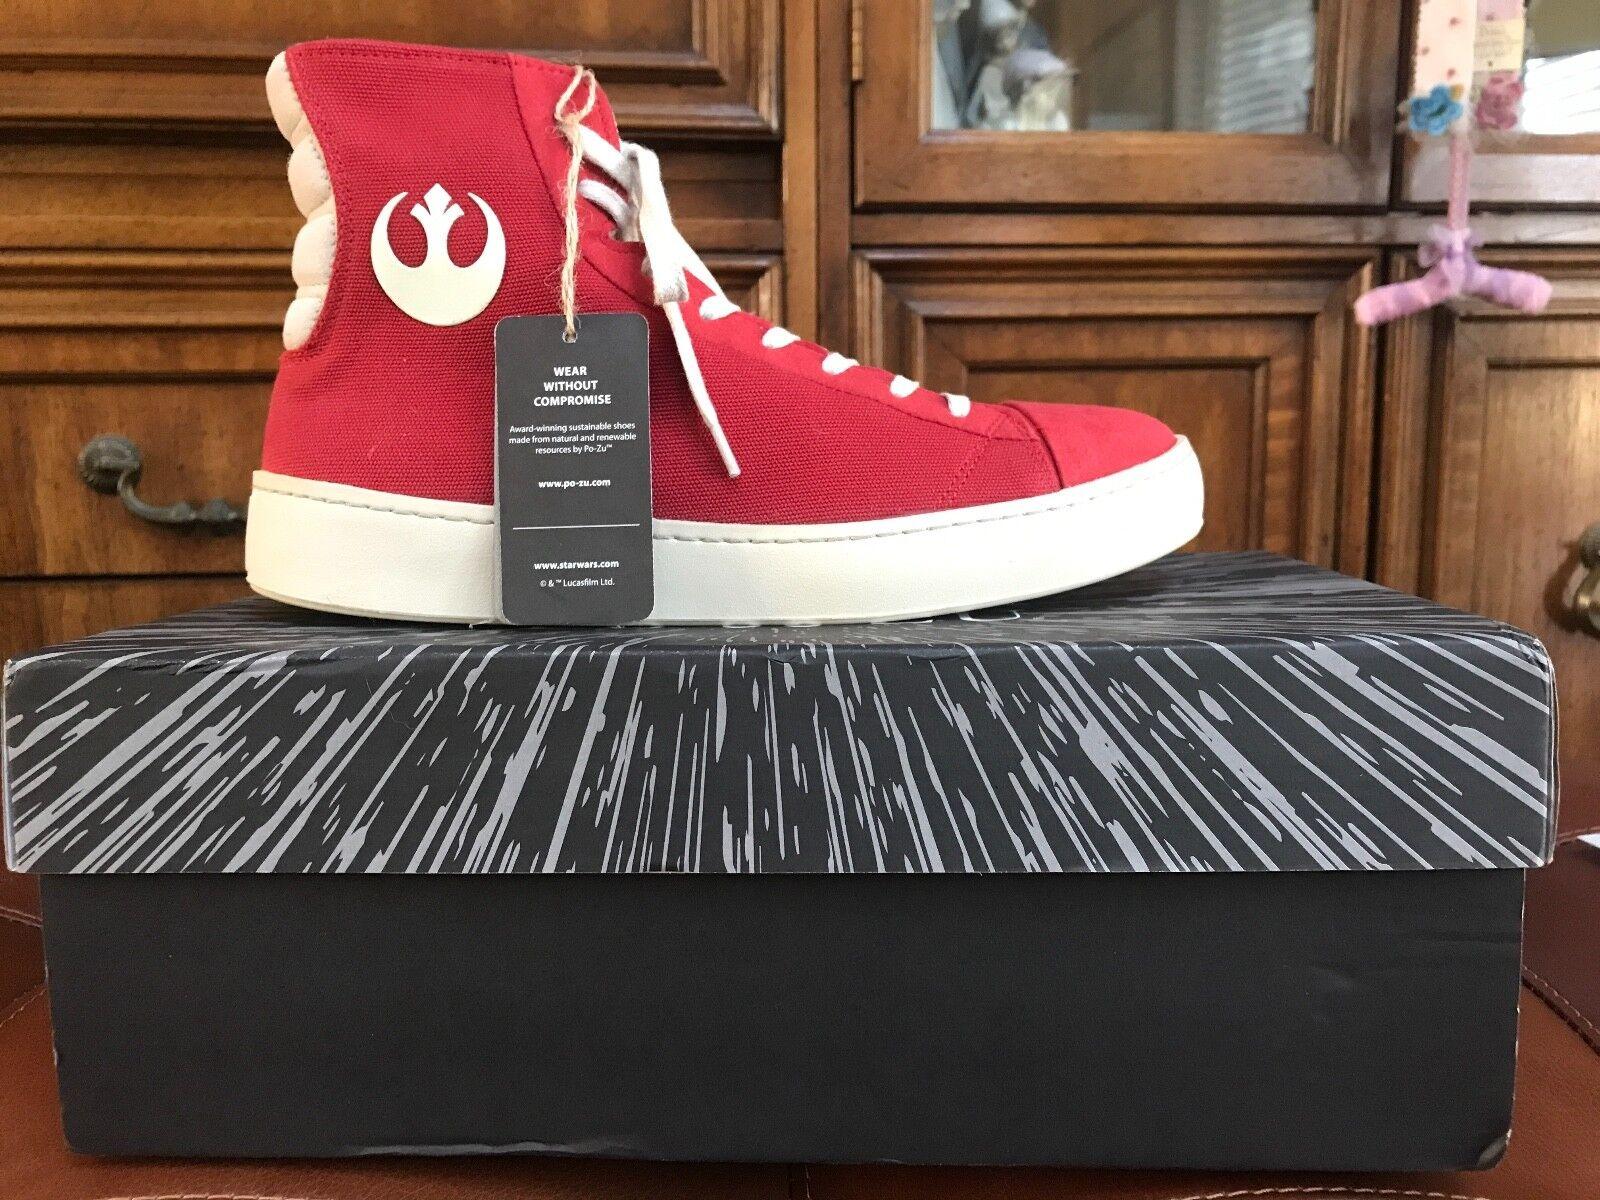 Po-ZU Star Wars Resistance Disney rojo alta Tops Poe Dameron zapatillas Talla 41